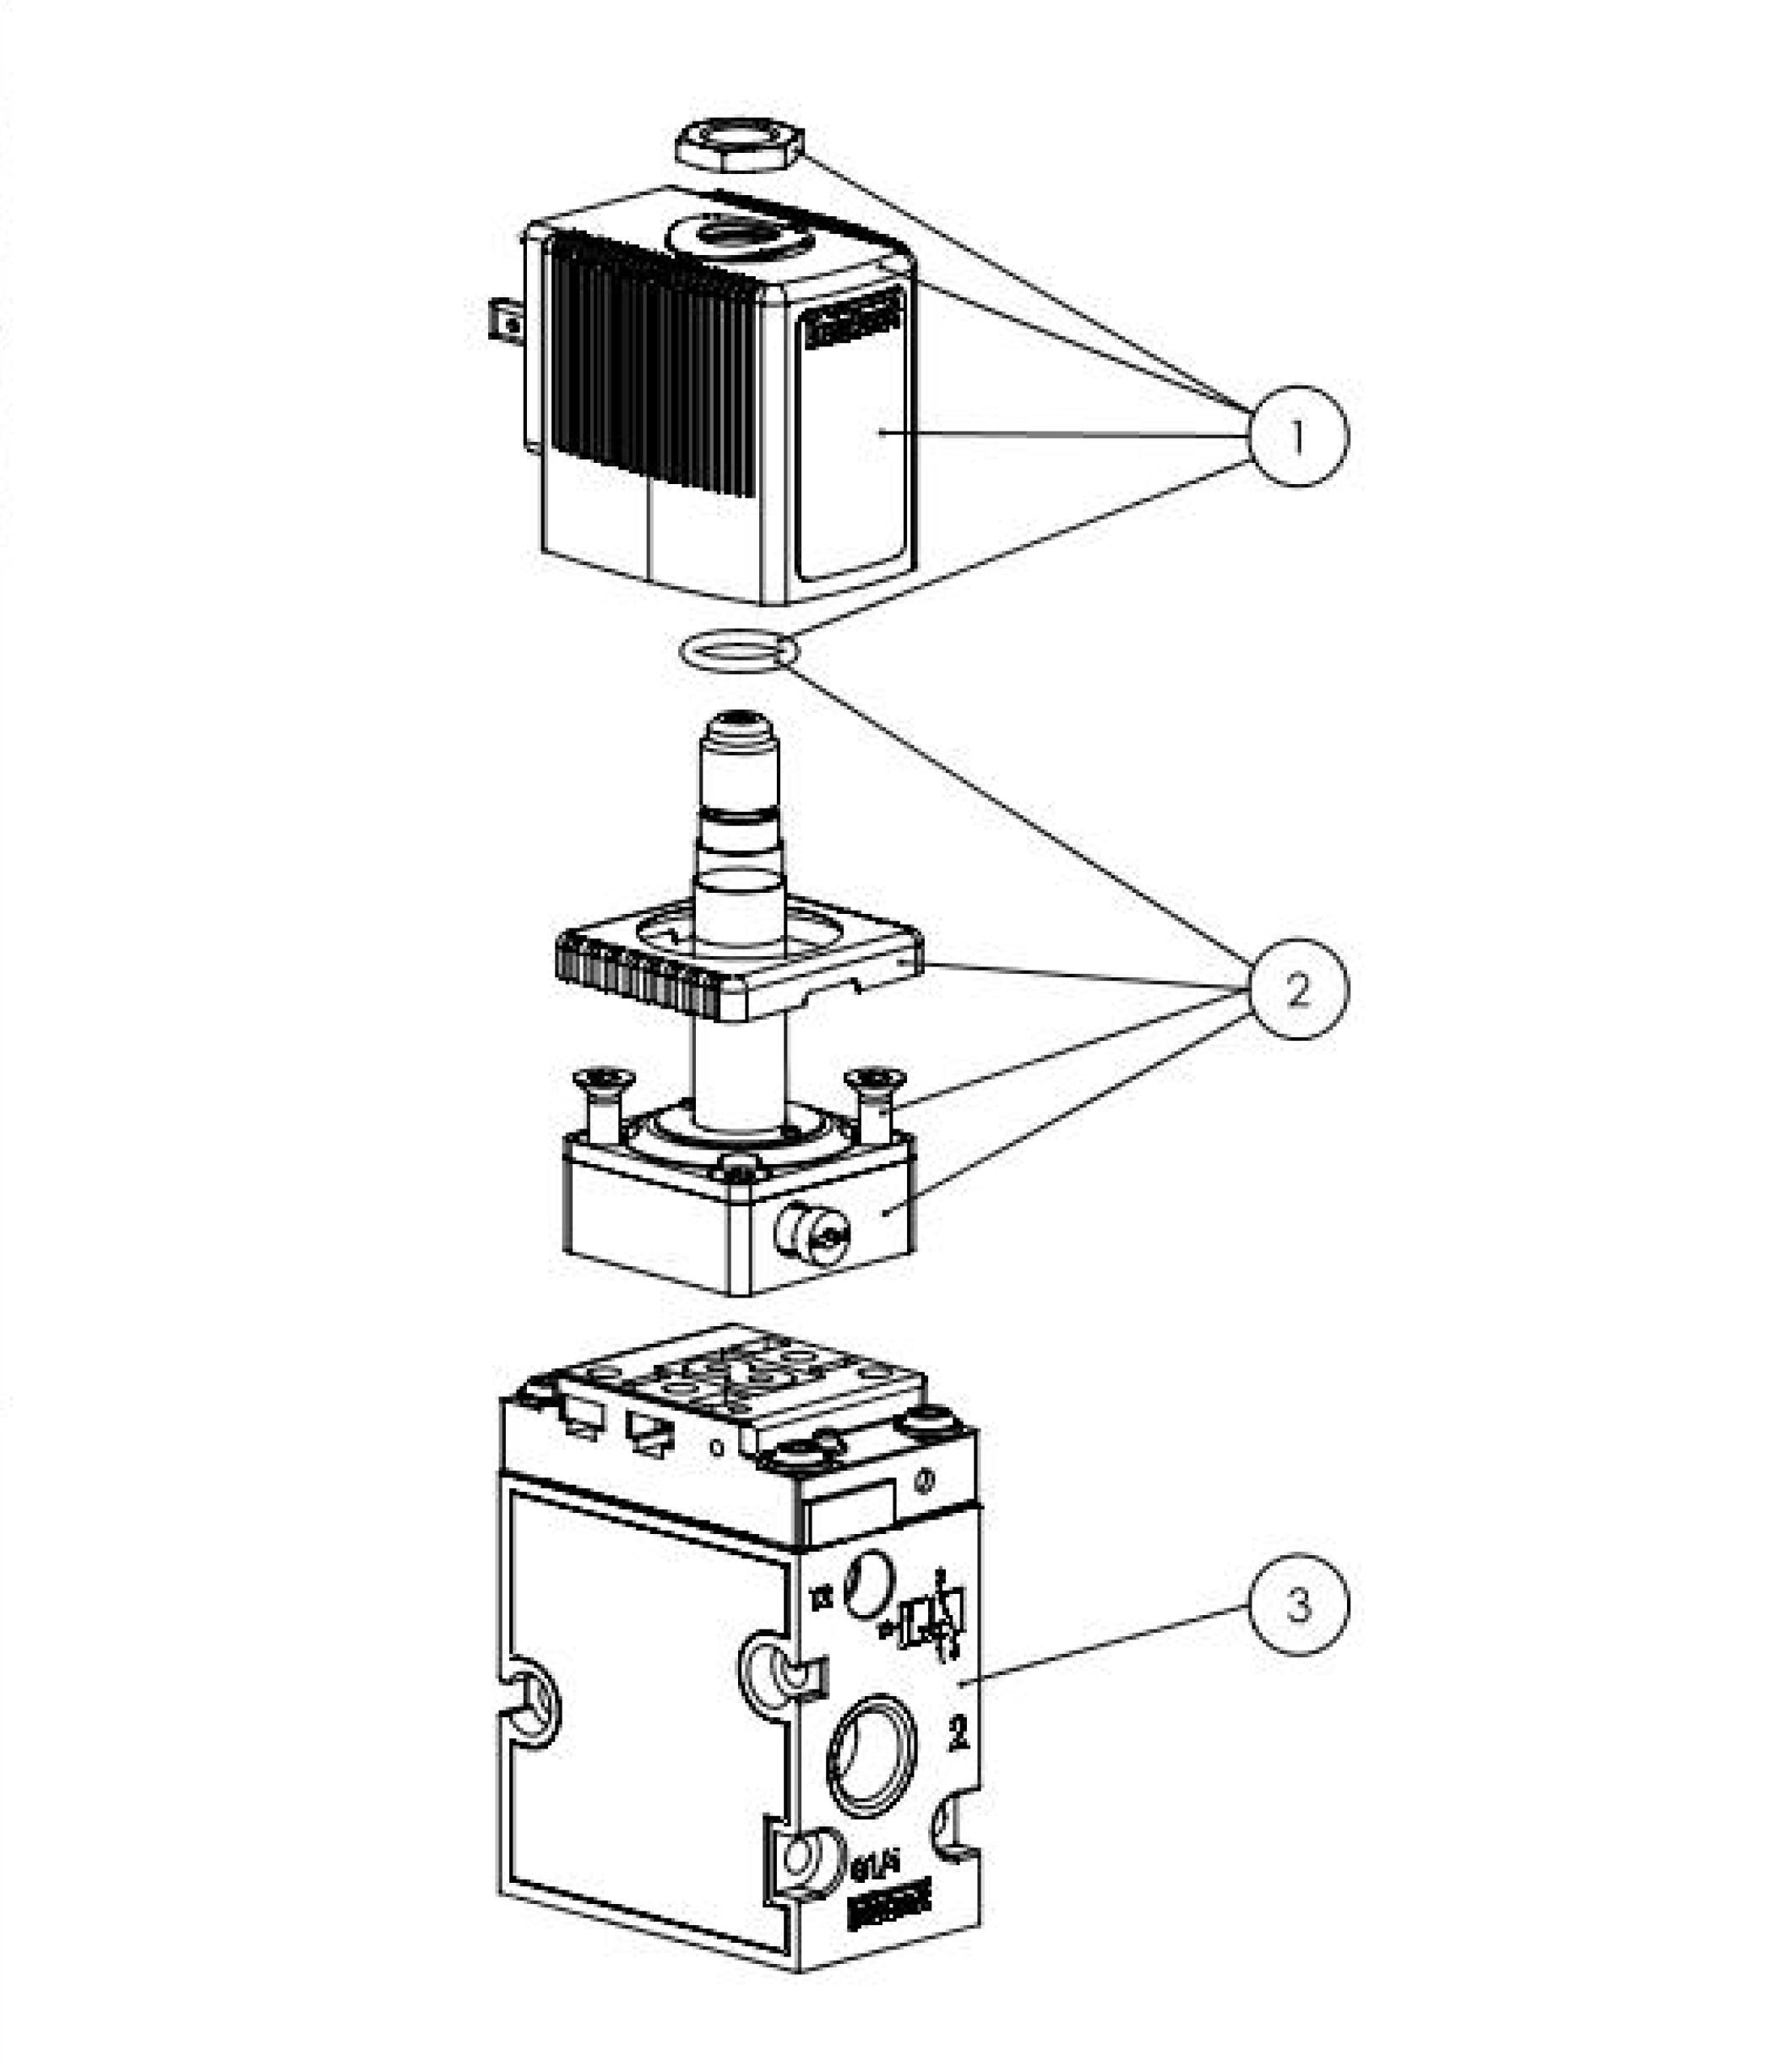 132459 - electrovanne pneumatique 3  2   electro 2    electro